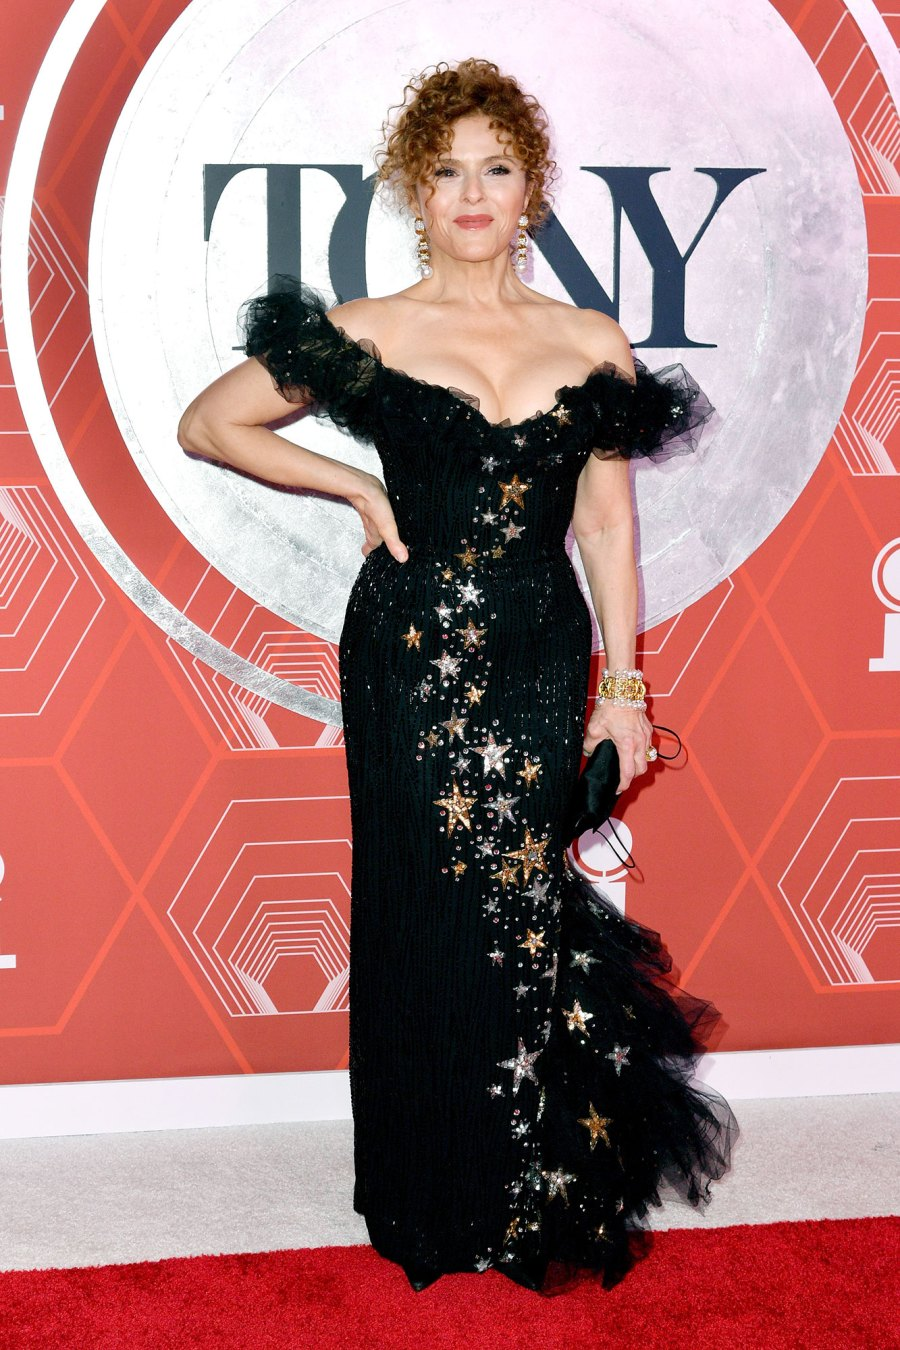 tony awards 2021 red carpet Bernadette Peters